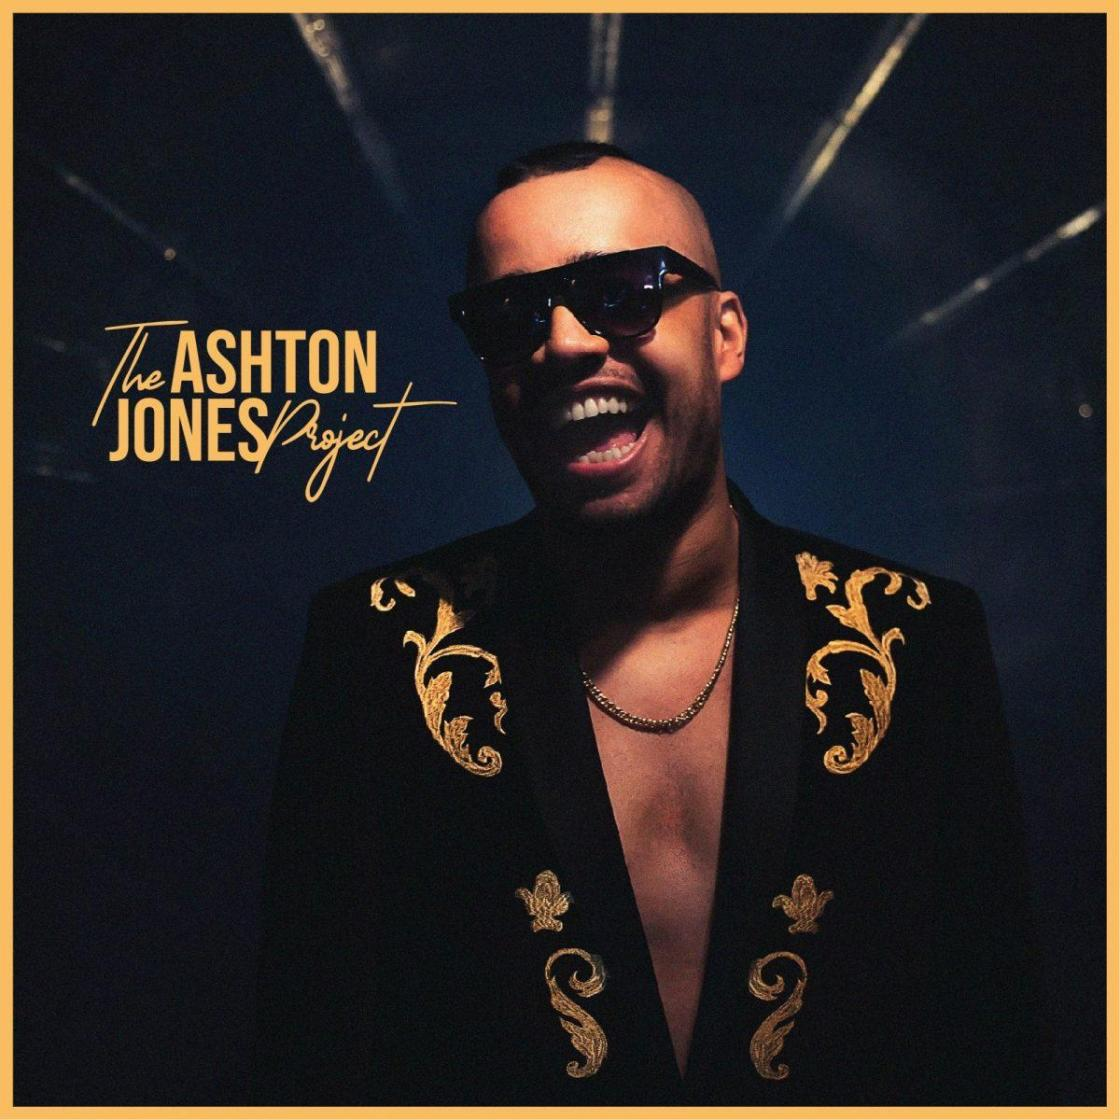 Exciting news! Ashton Jones has released his debut EP, The Ashton Jones Project ...